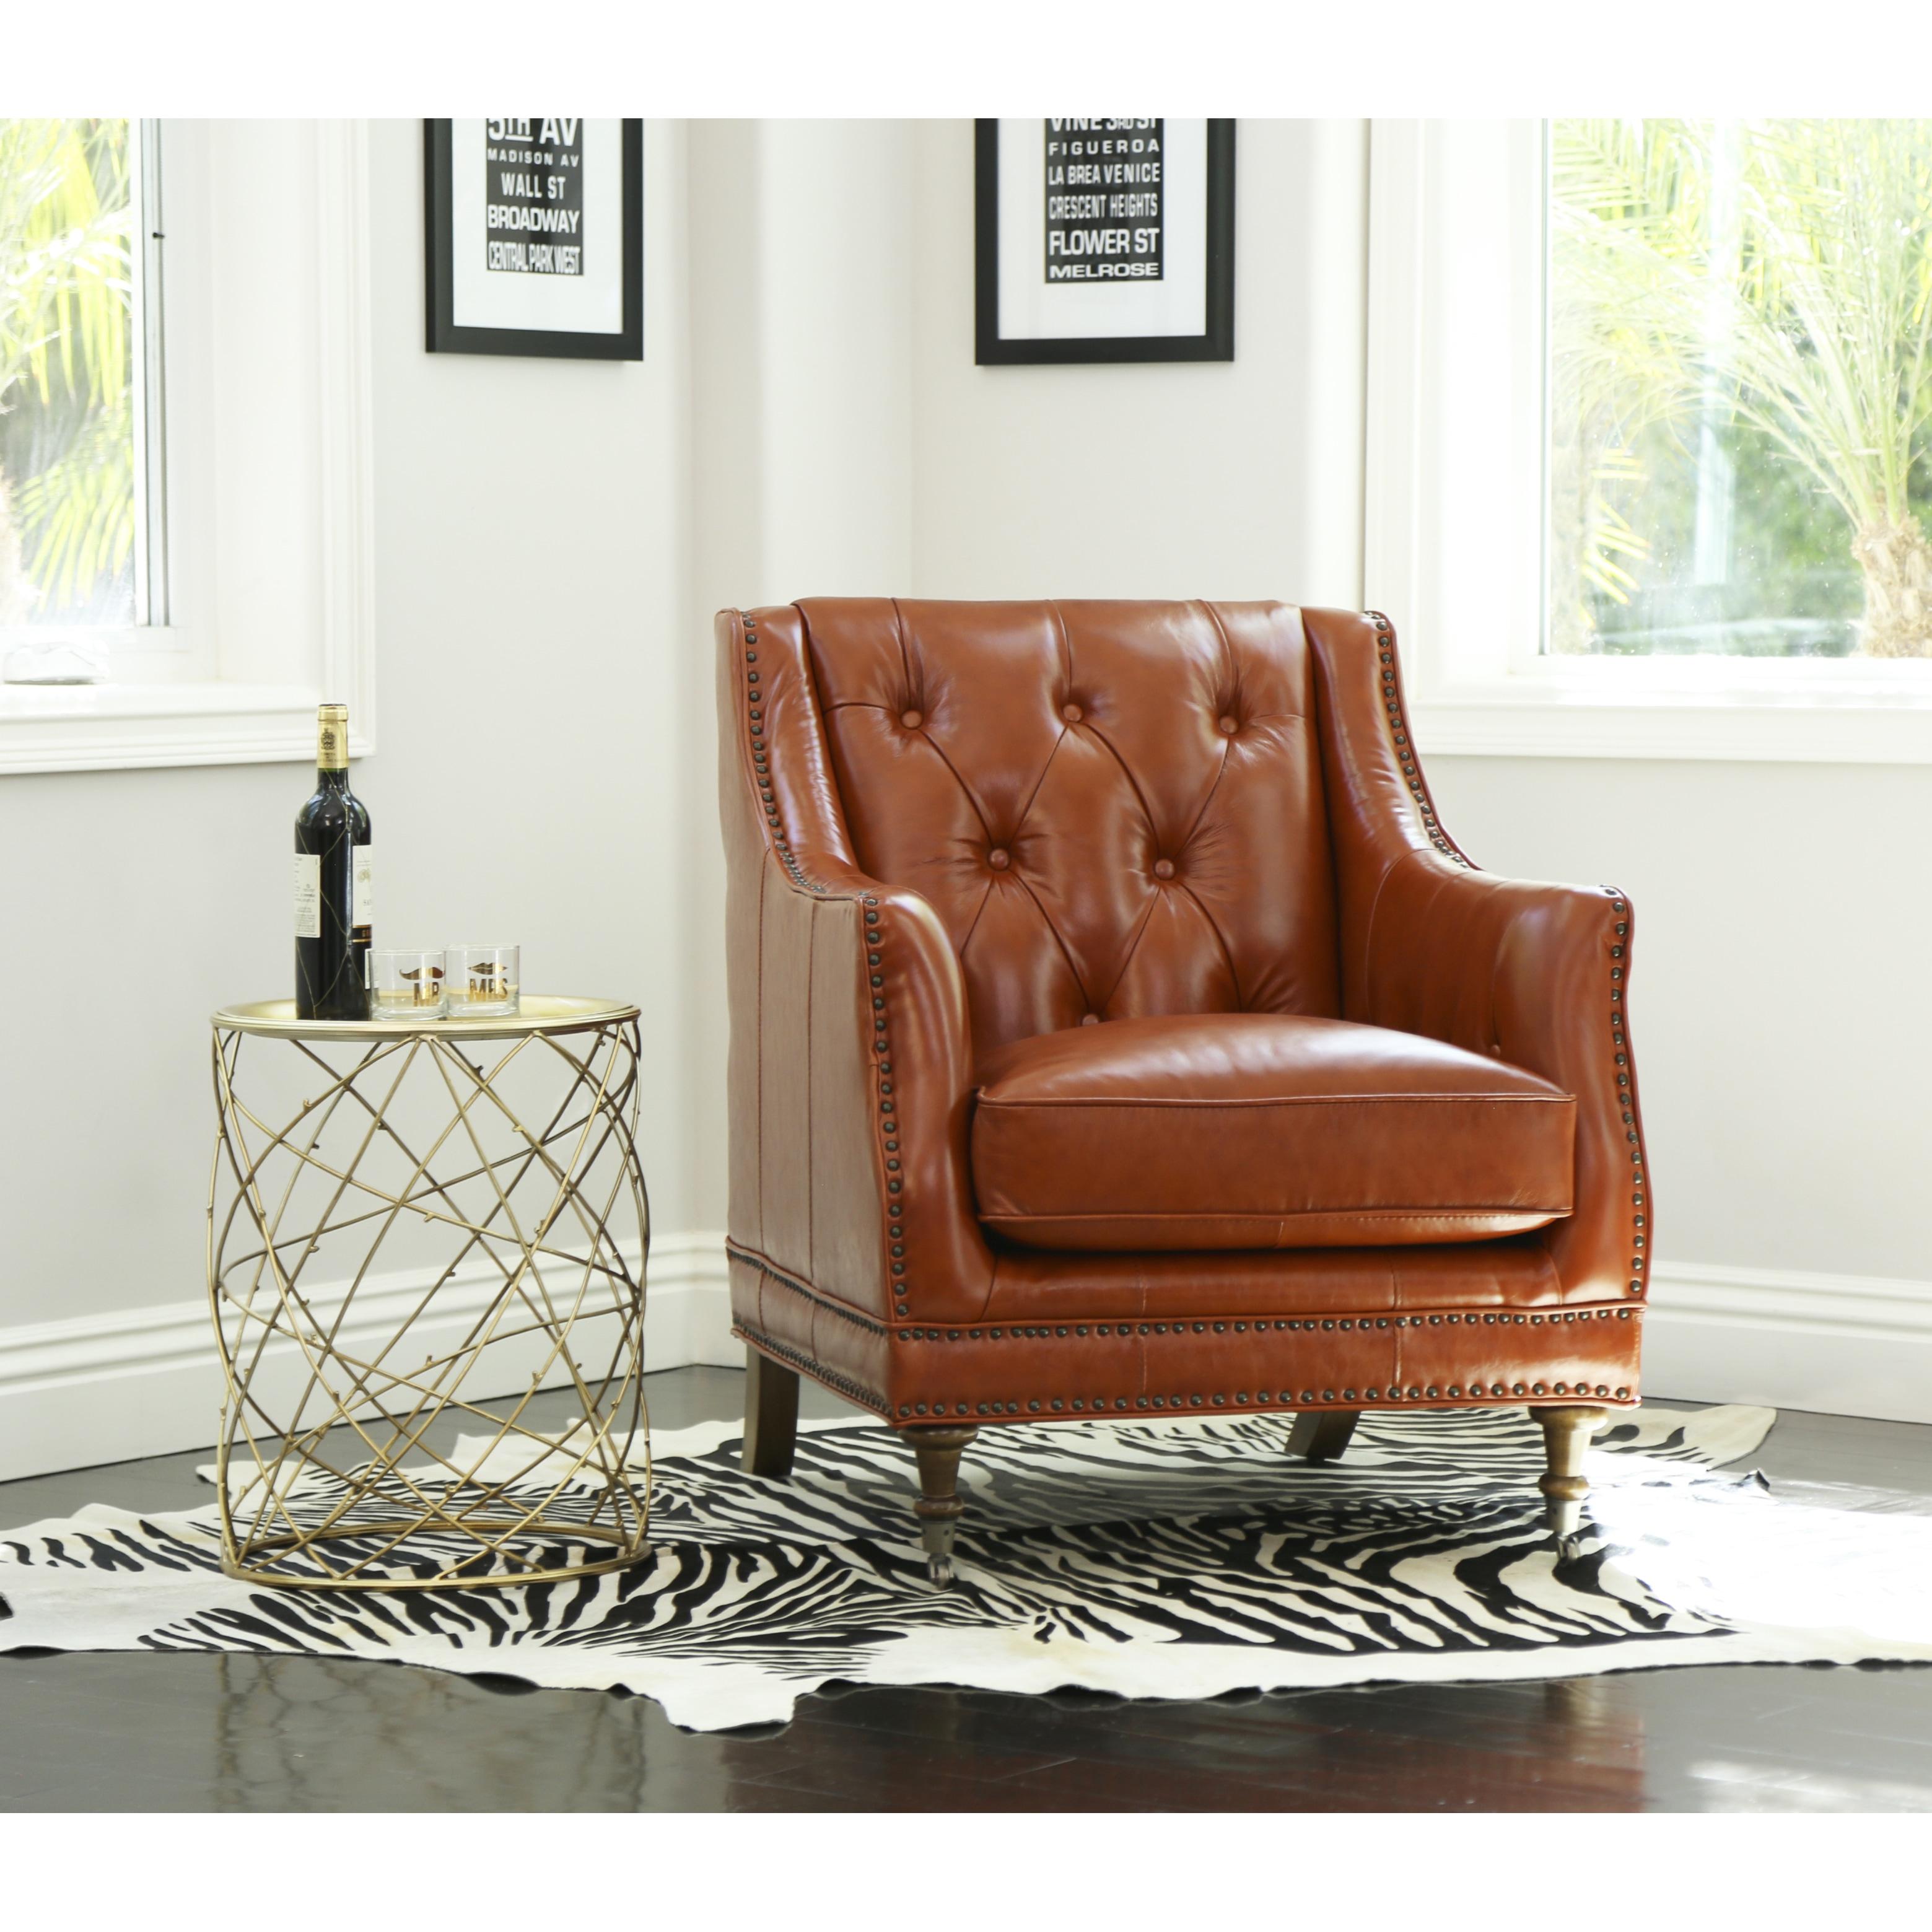 Attirant Shop Abbyson Nixon Burnt Orange Top Grain Wax Leather Chair   On Sale    Free Shipping Today   Overstock.com   16693125